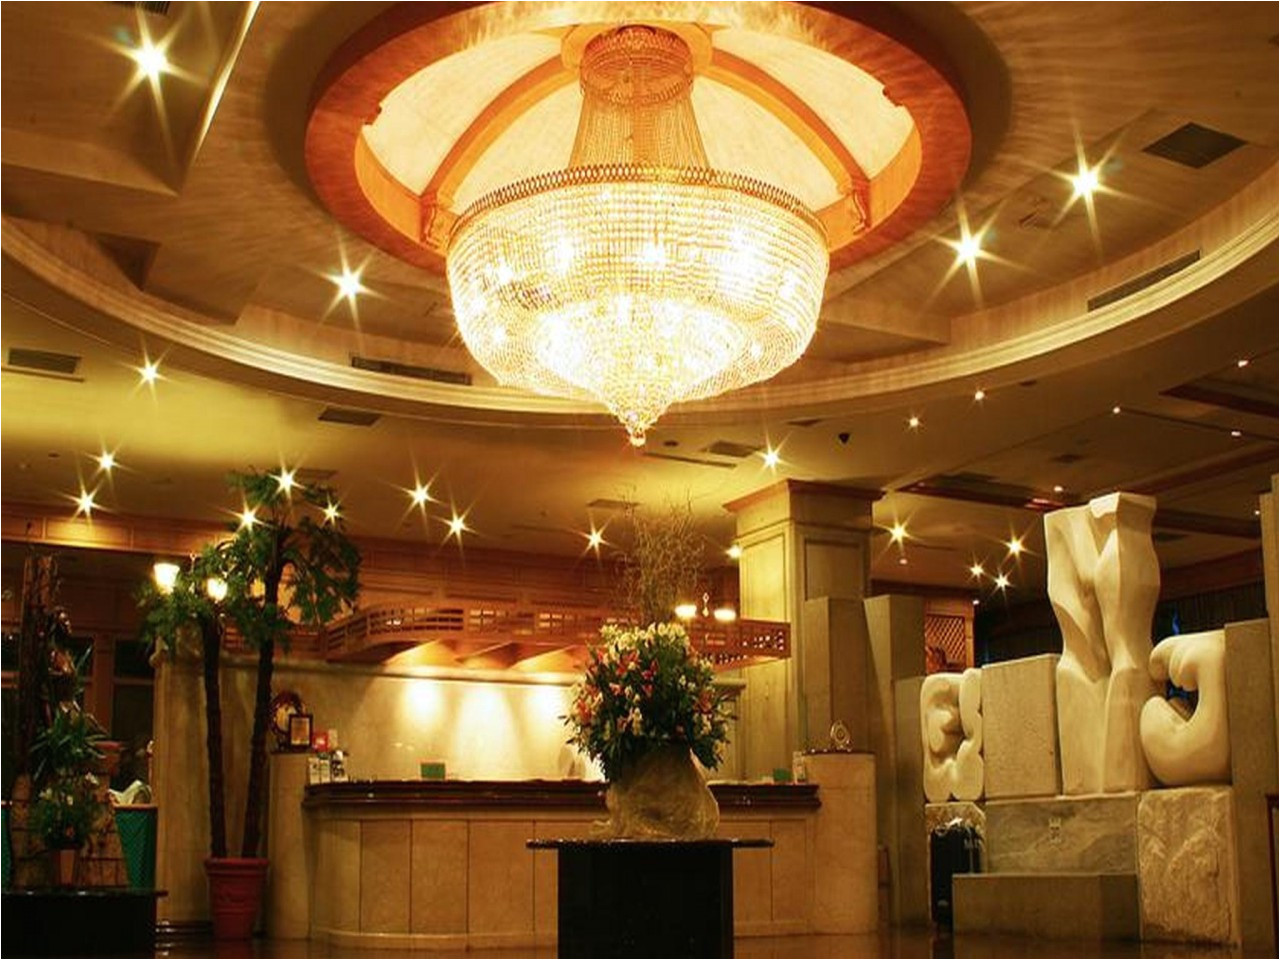 highness hotel taoyuan hotel innenbereich 63671 1280x1280 jpg